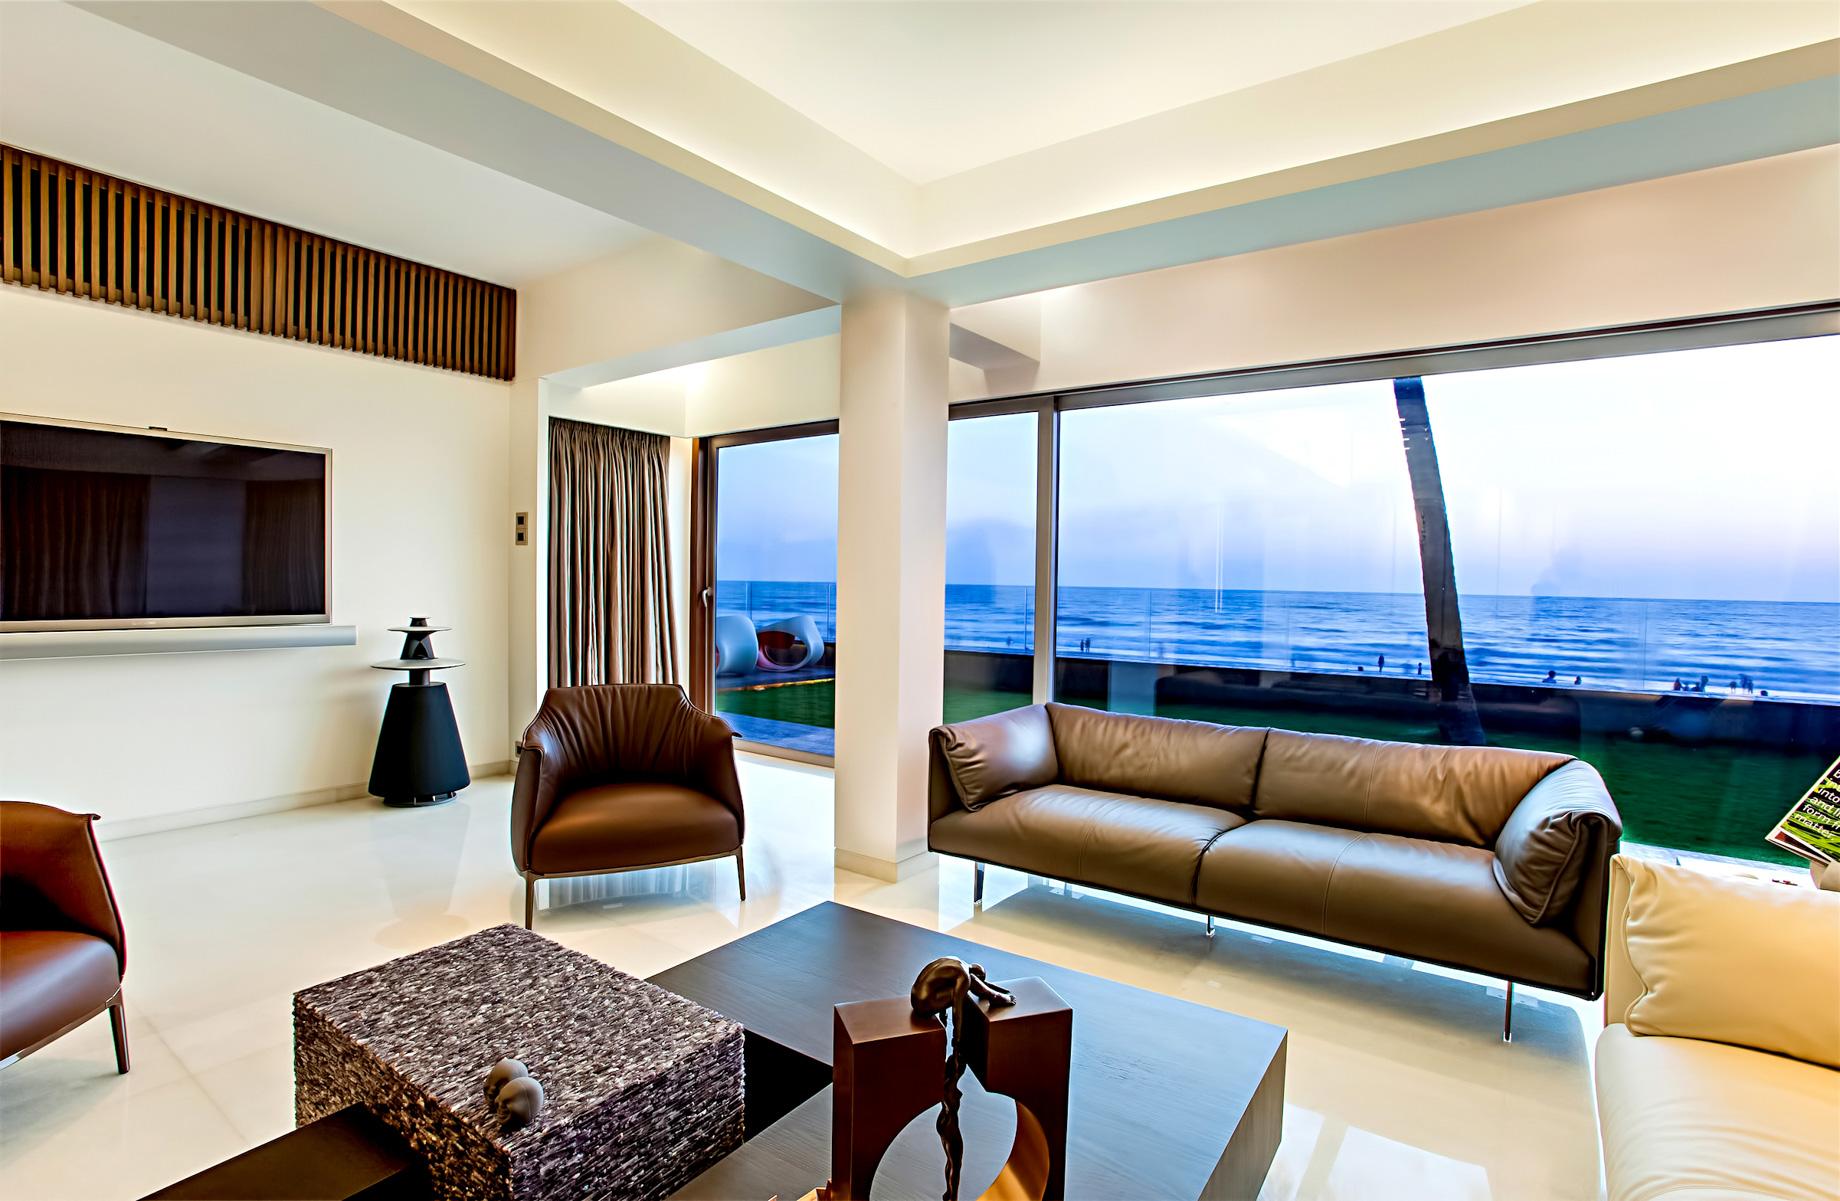 Juhu Beach Apartment – Mumbai, Maharashtra, India